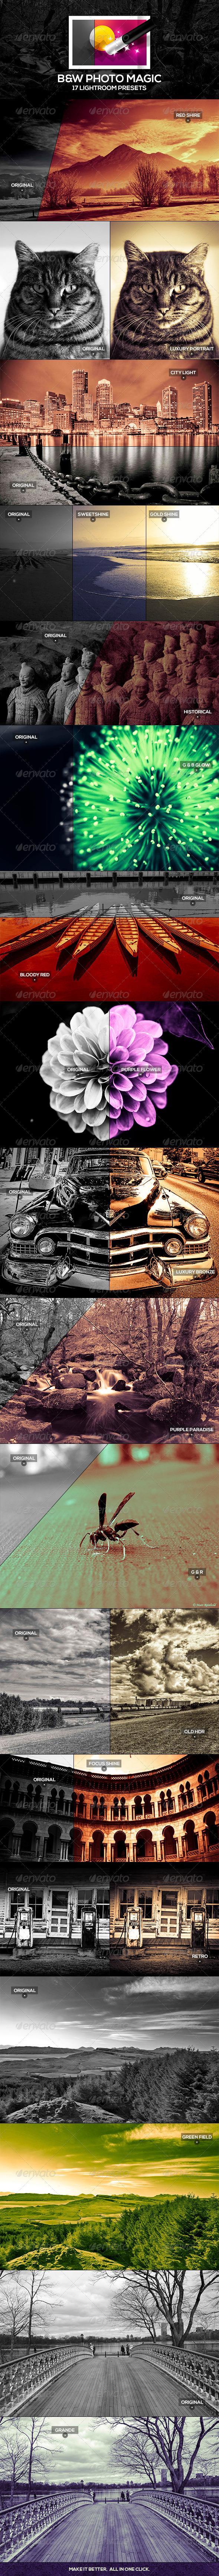 GraphicRiver B&W Photo Magic Lightroom Presets 4806871